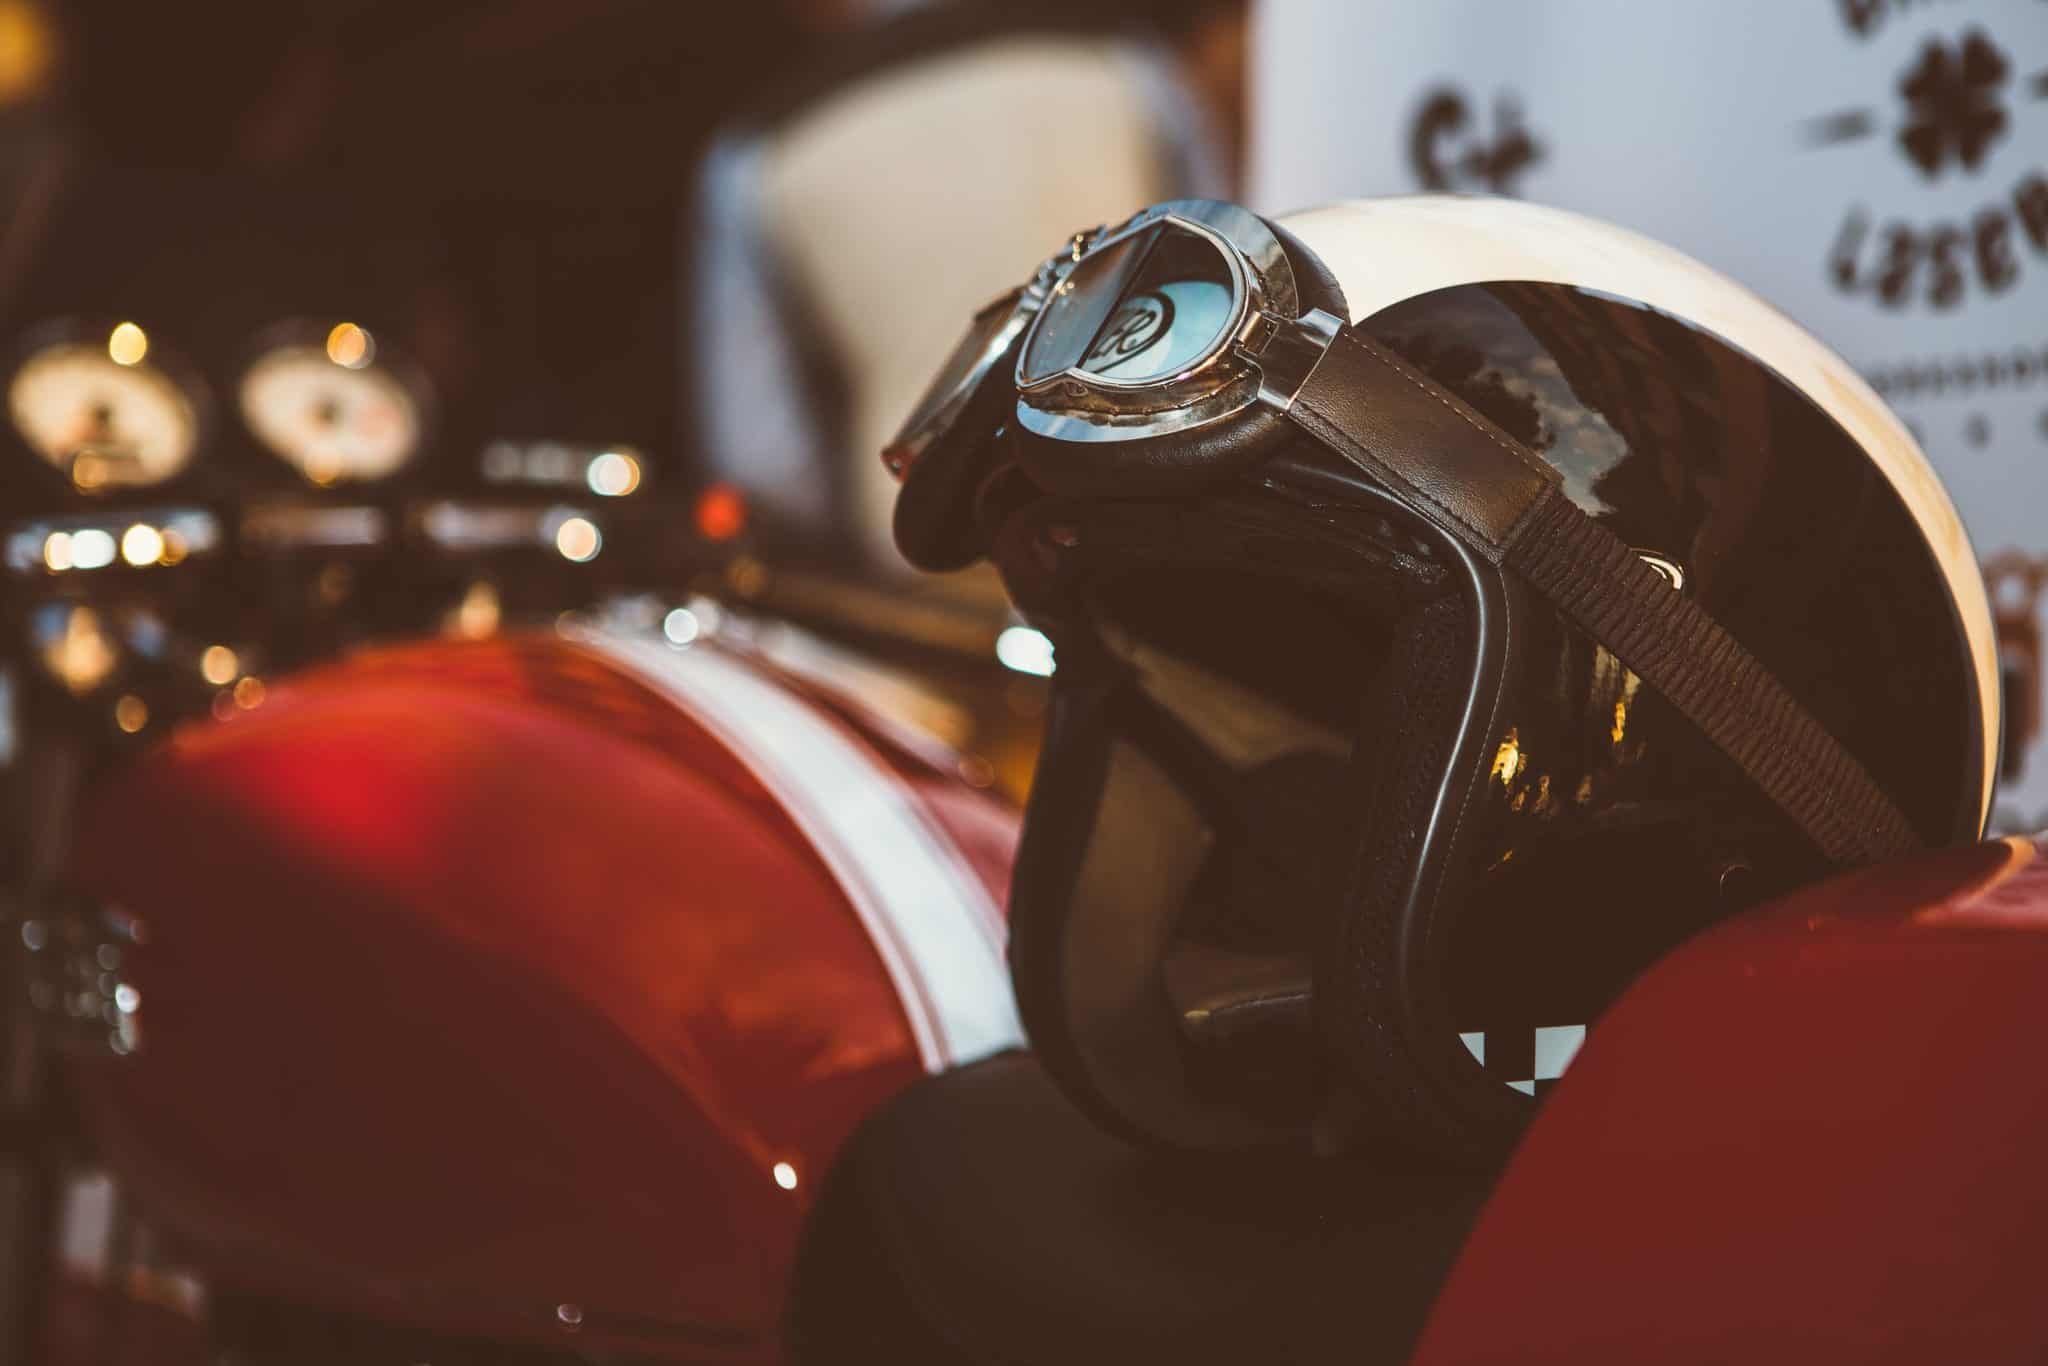 limpiar el casco de la moto